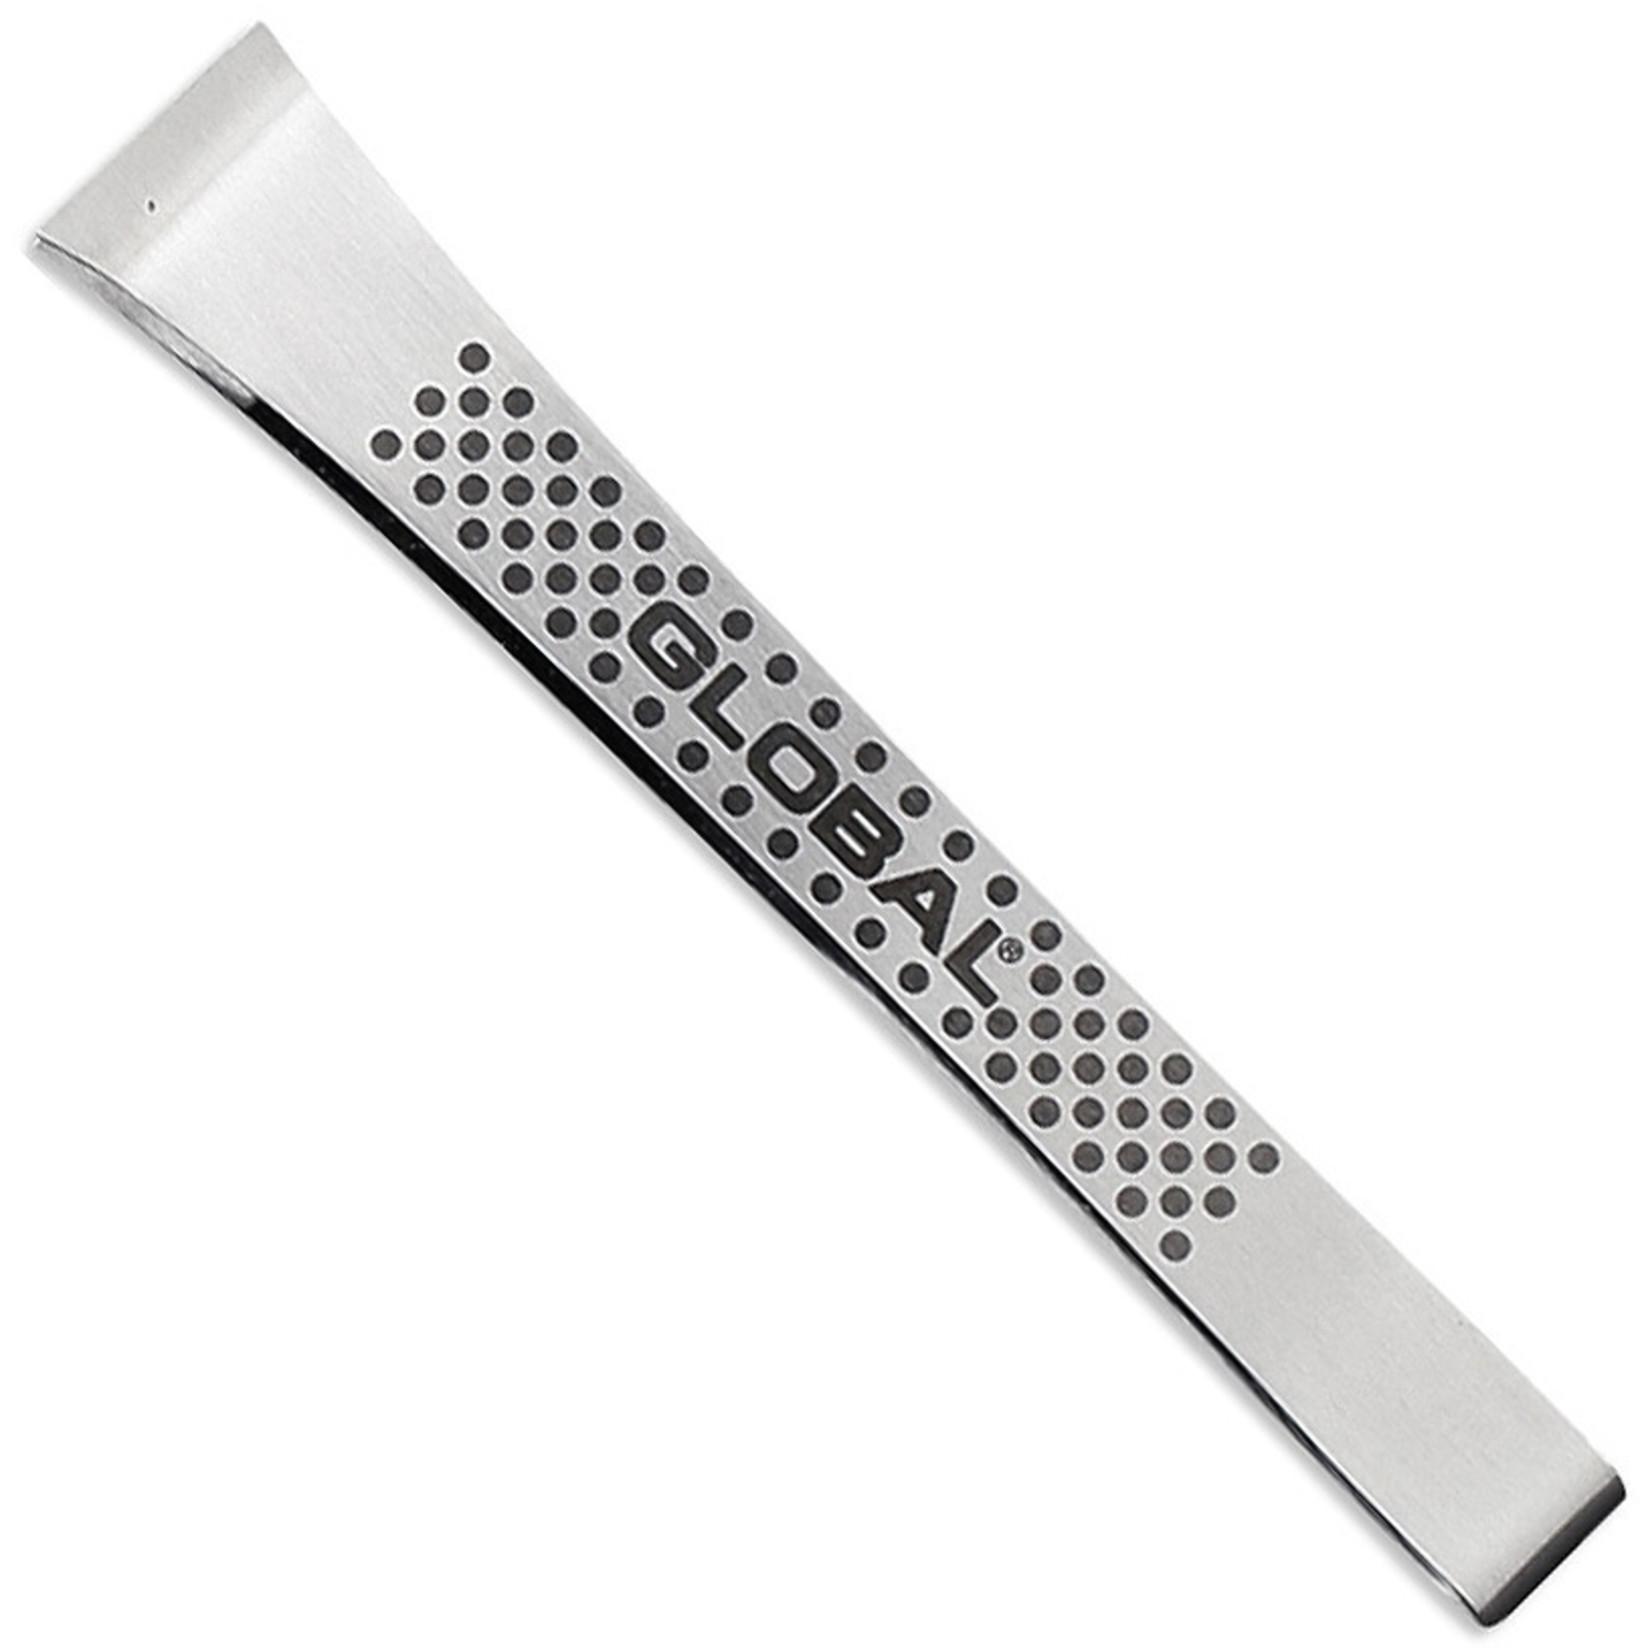 Global Global GS20B visgraatpincet 11,5cm